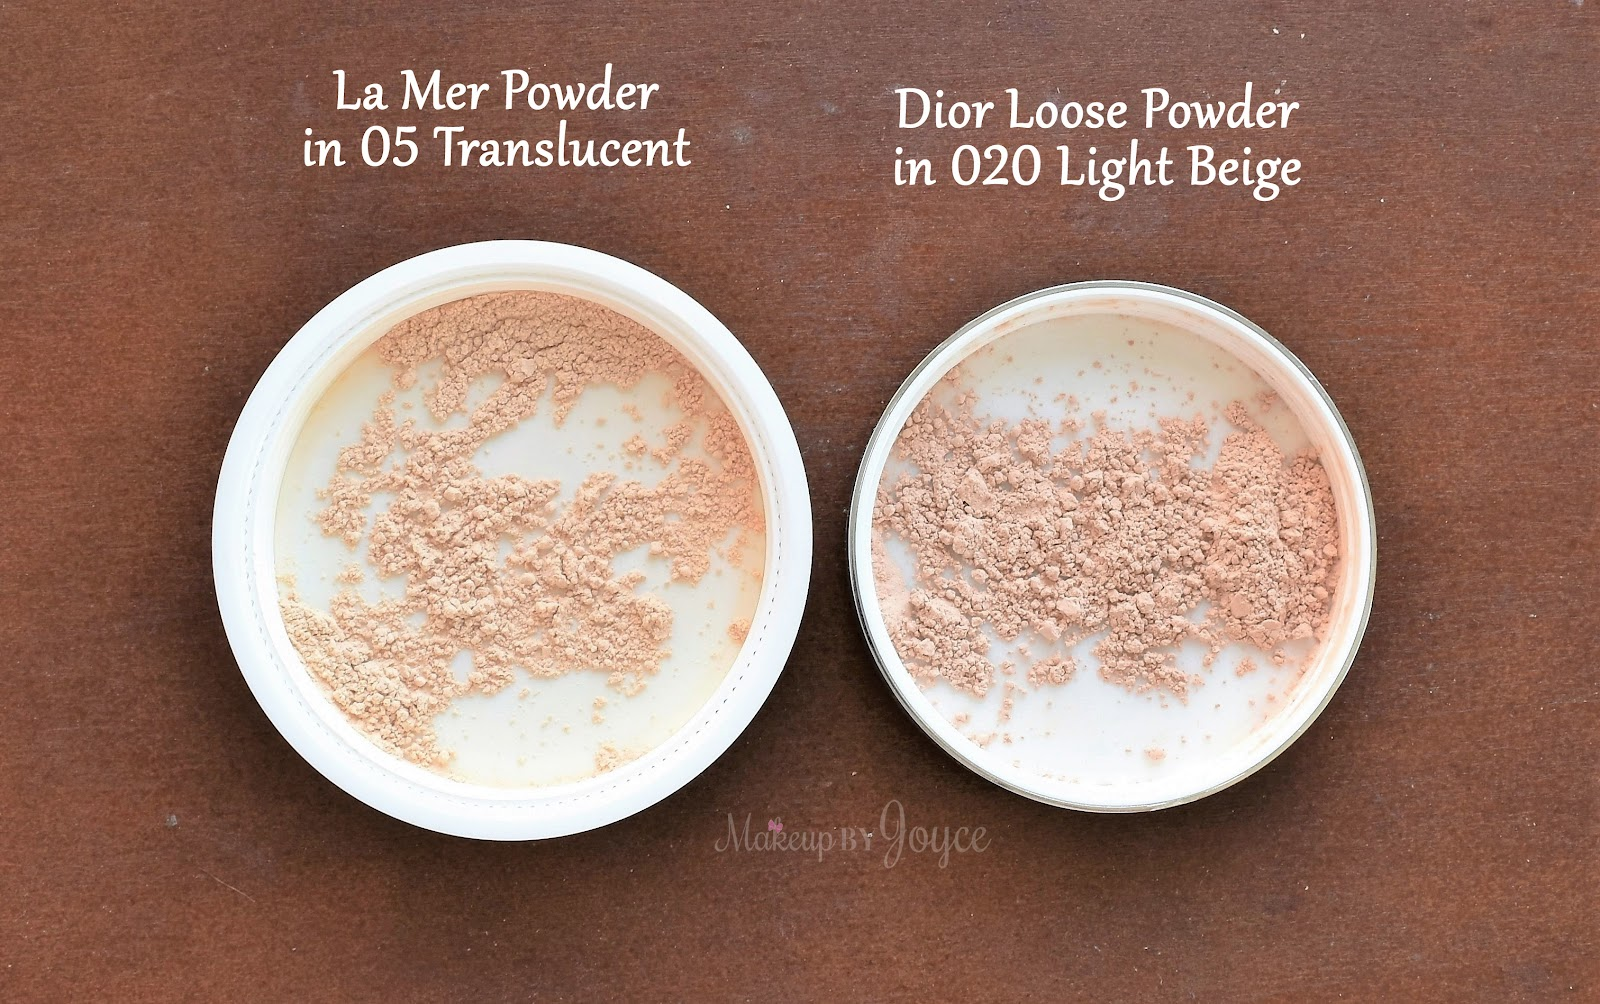 Powder review